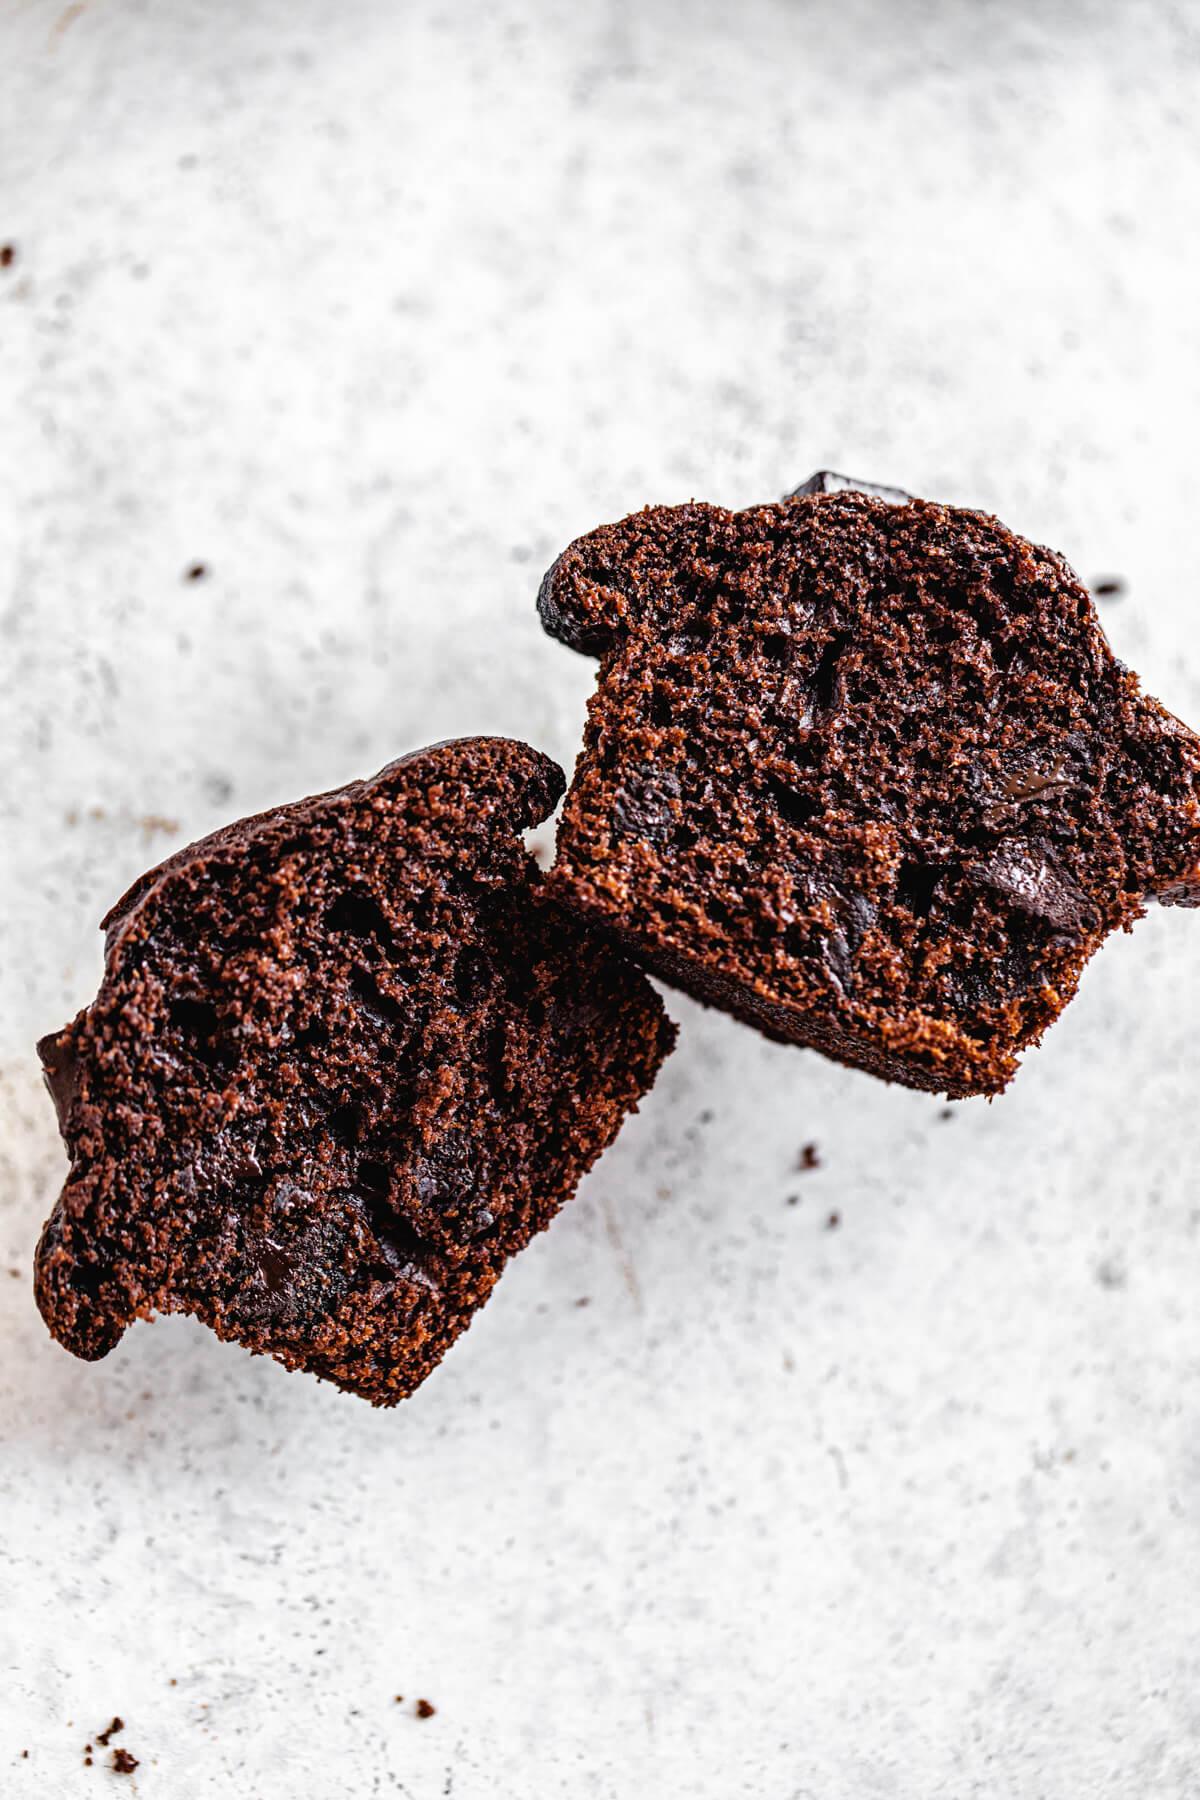 halved chocolate muffins